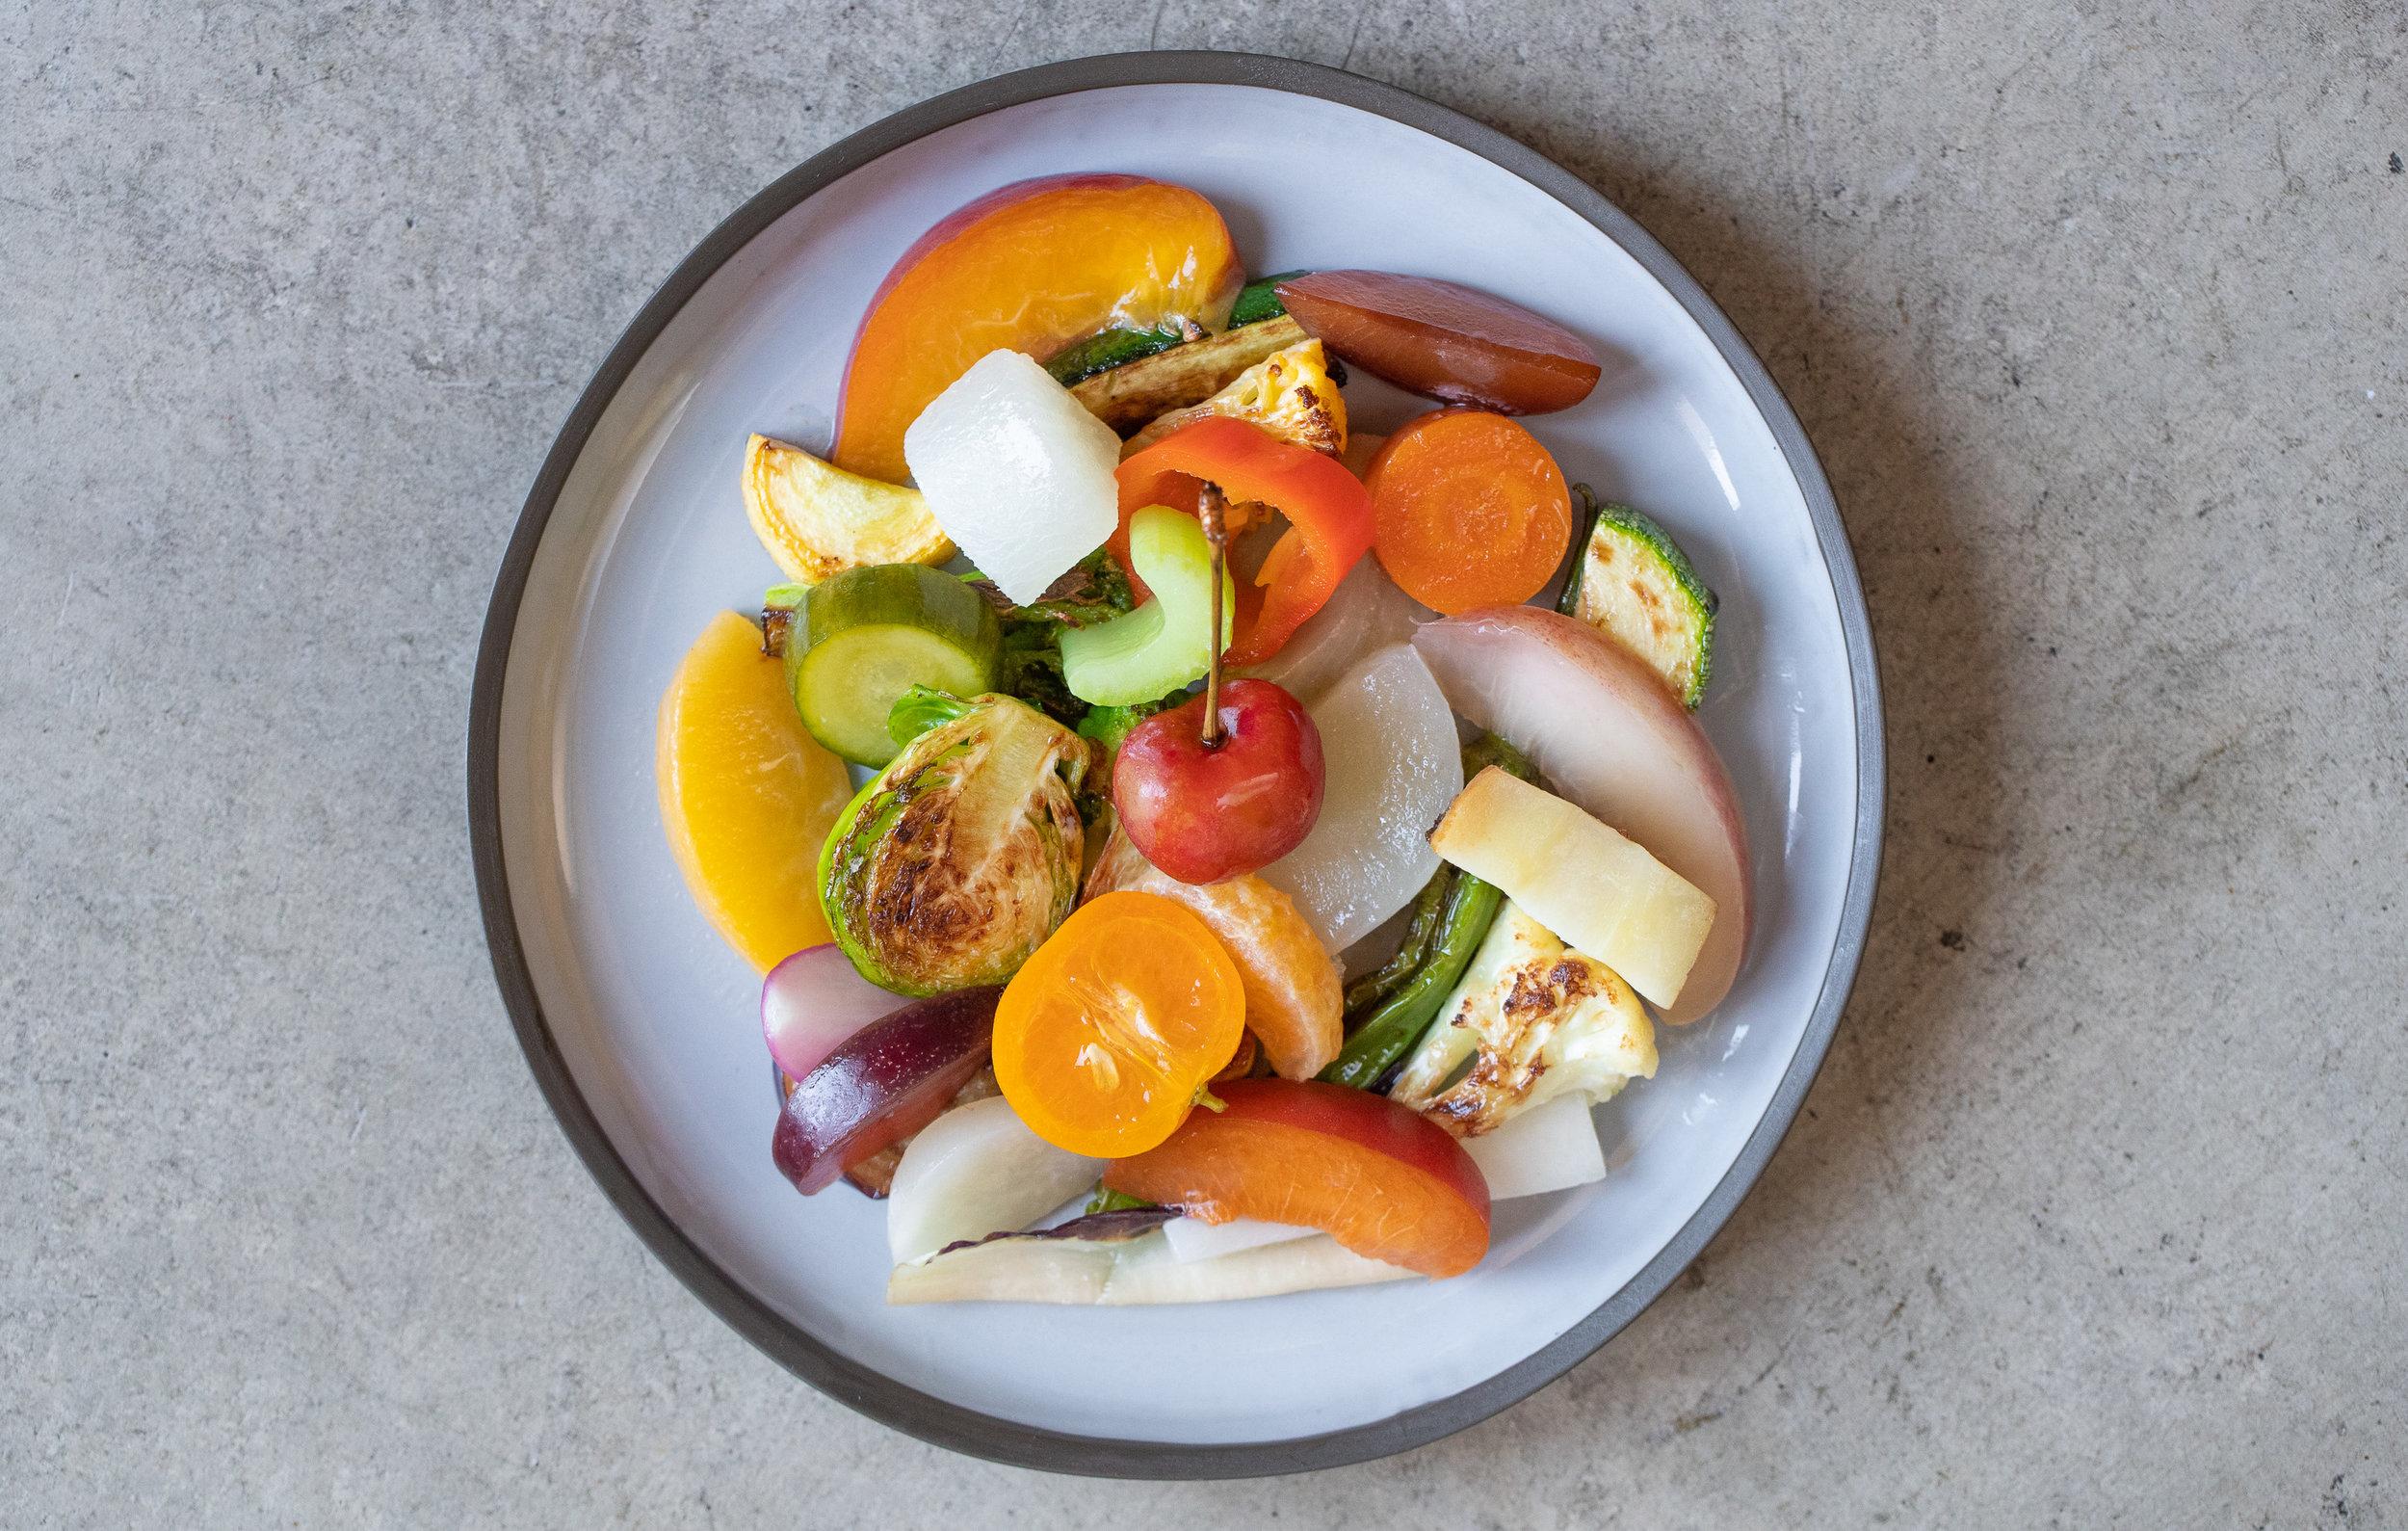 Vegetable & Fruit Plate.jpg